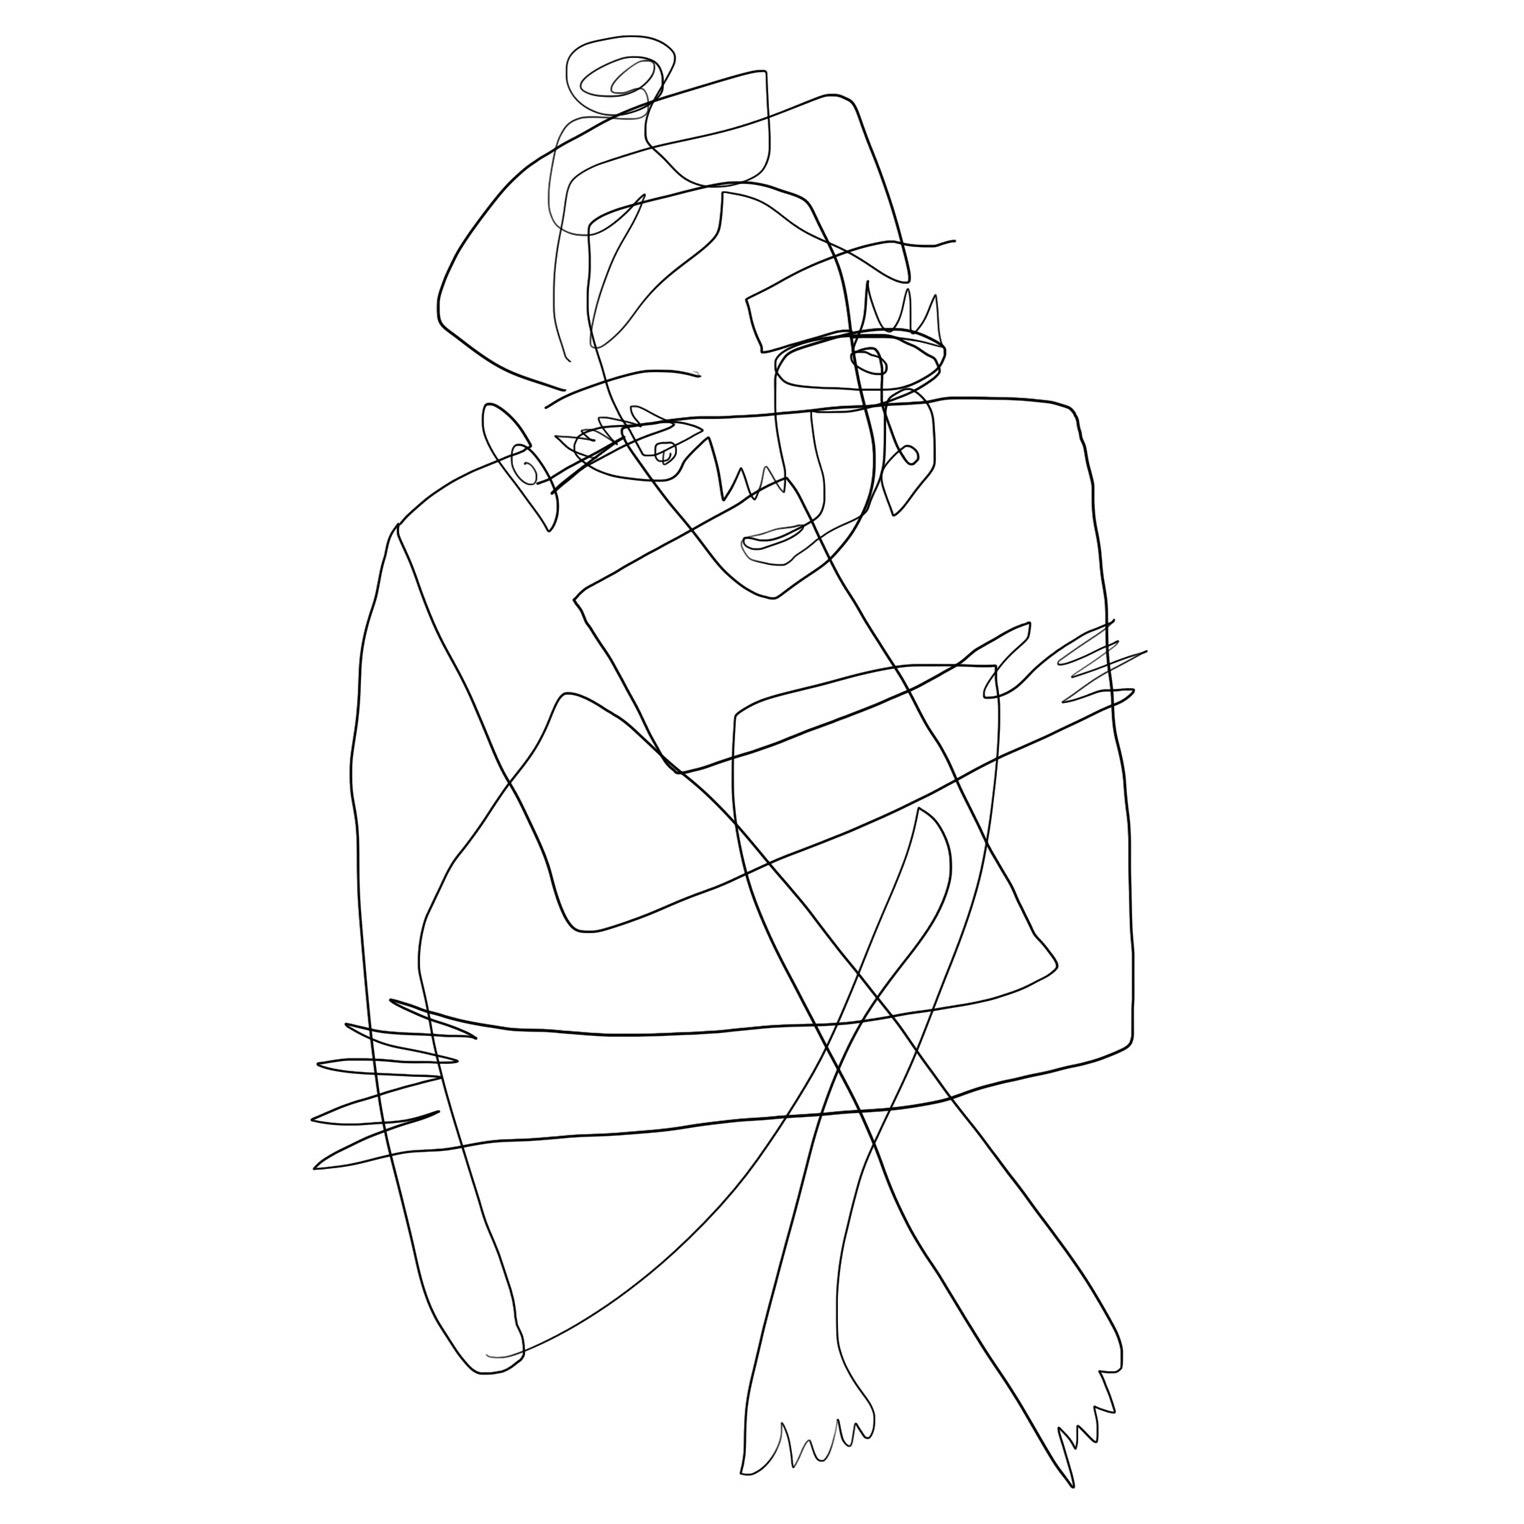 doodles (1).jpg